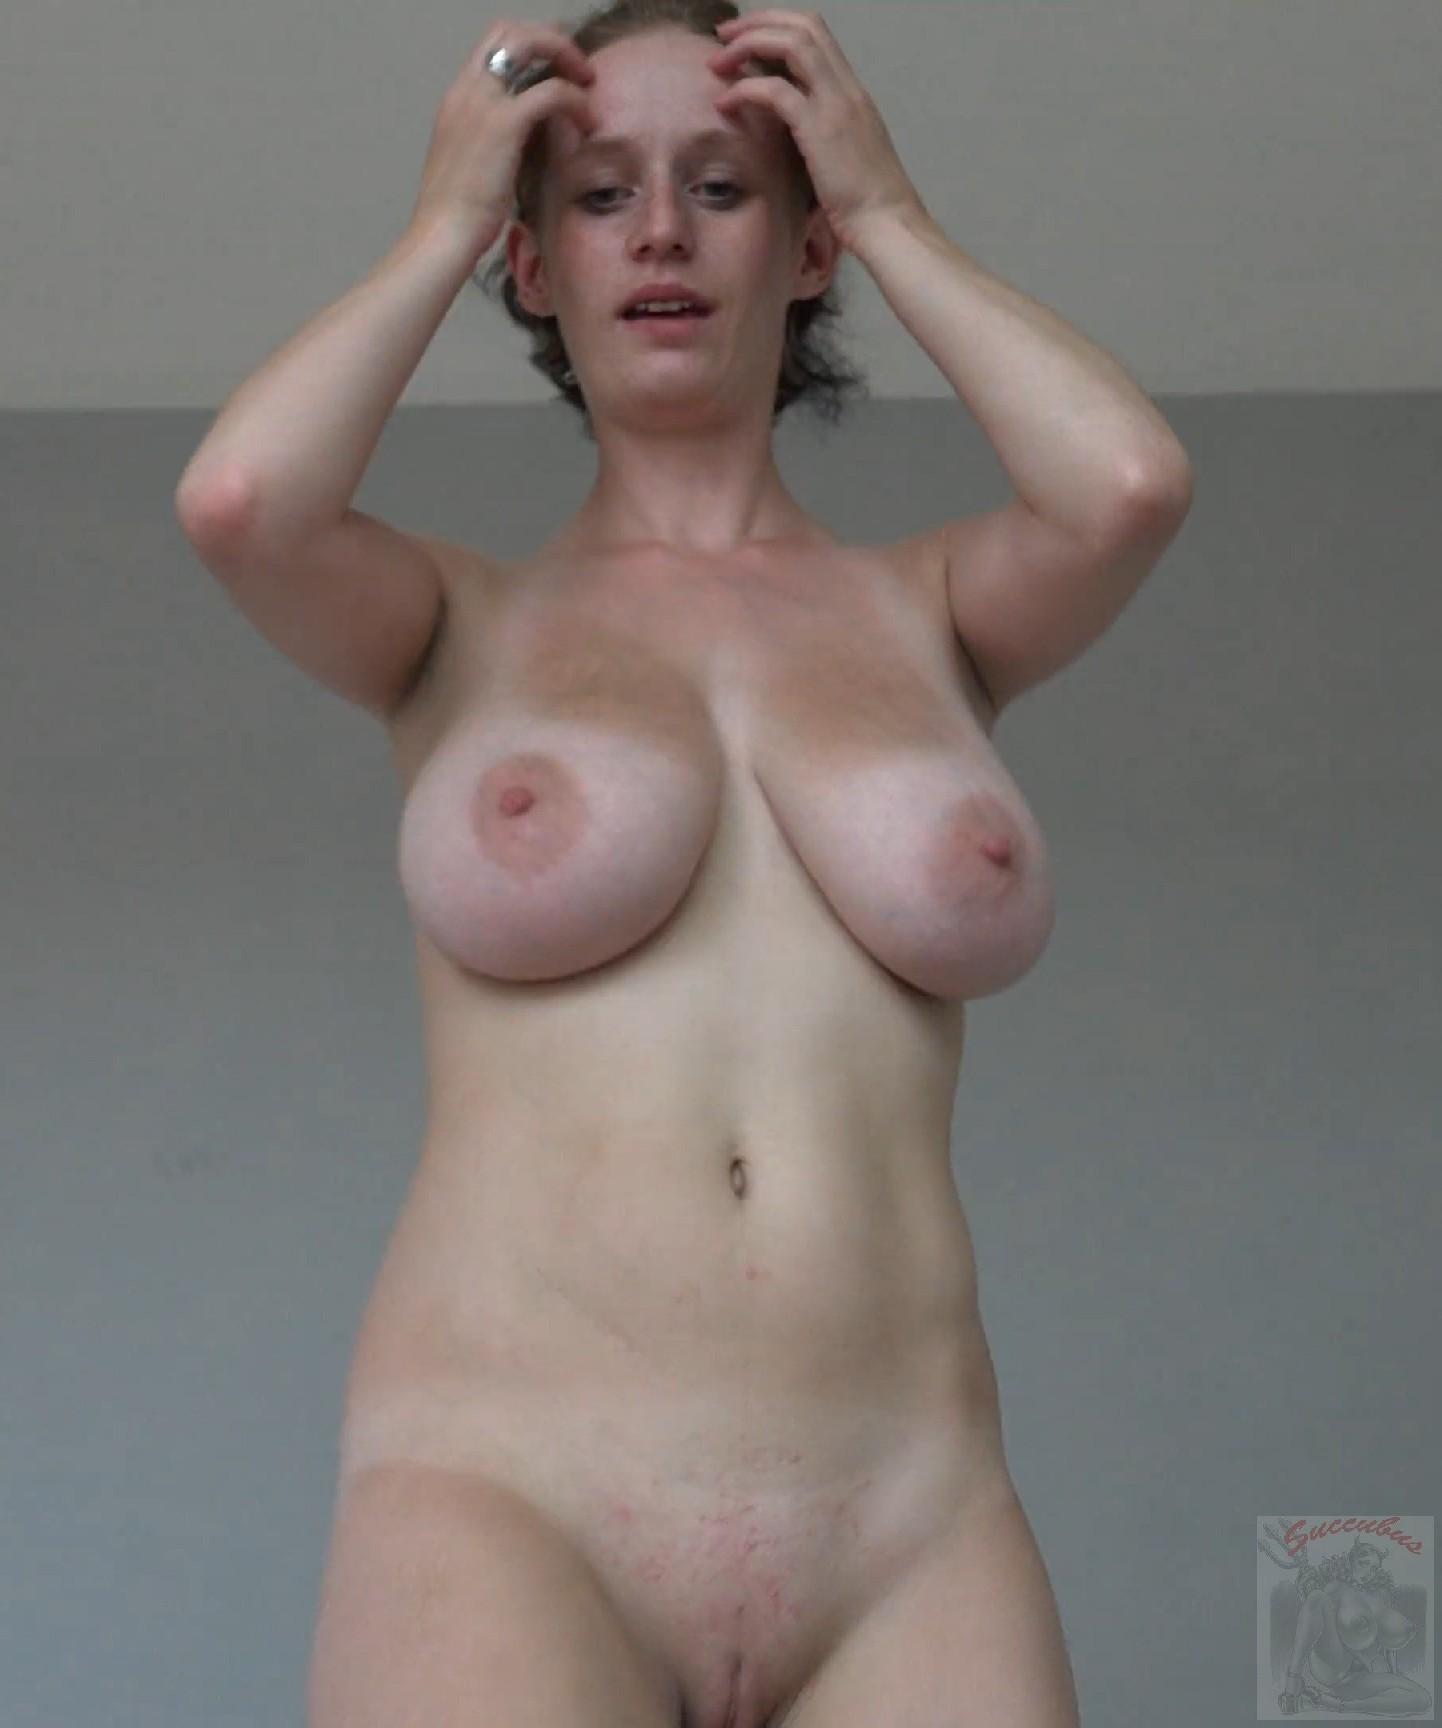 целом плохие тетки голые титьки фото околицей домбе гранде